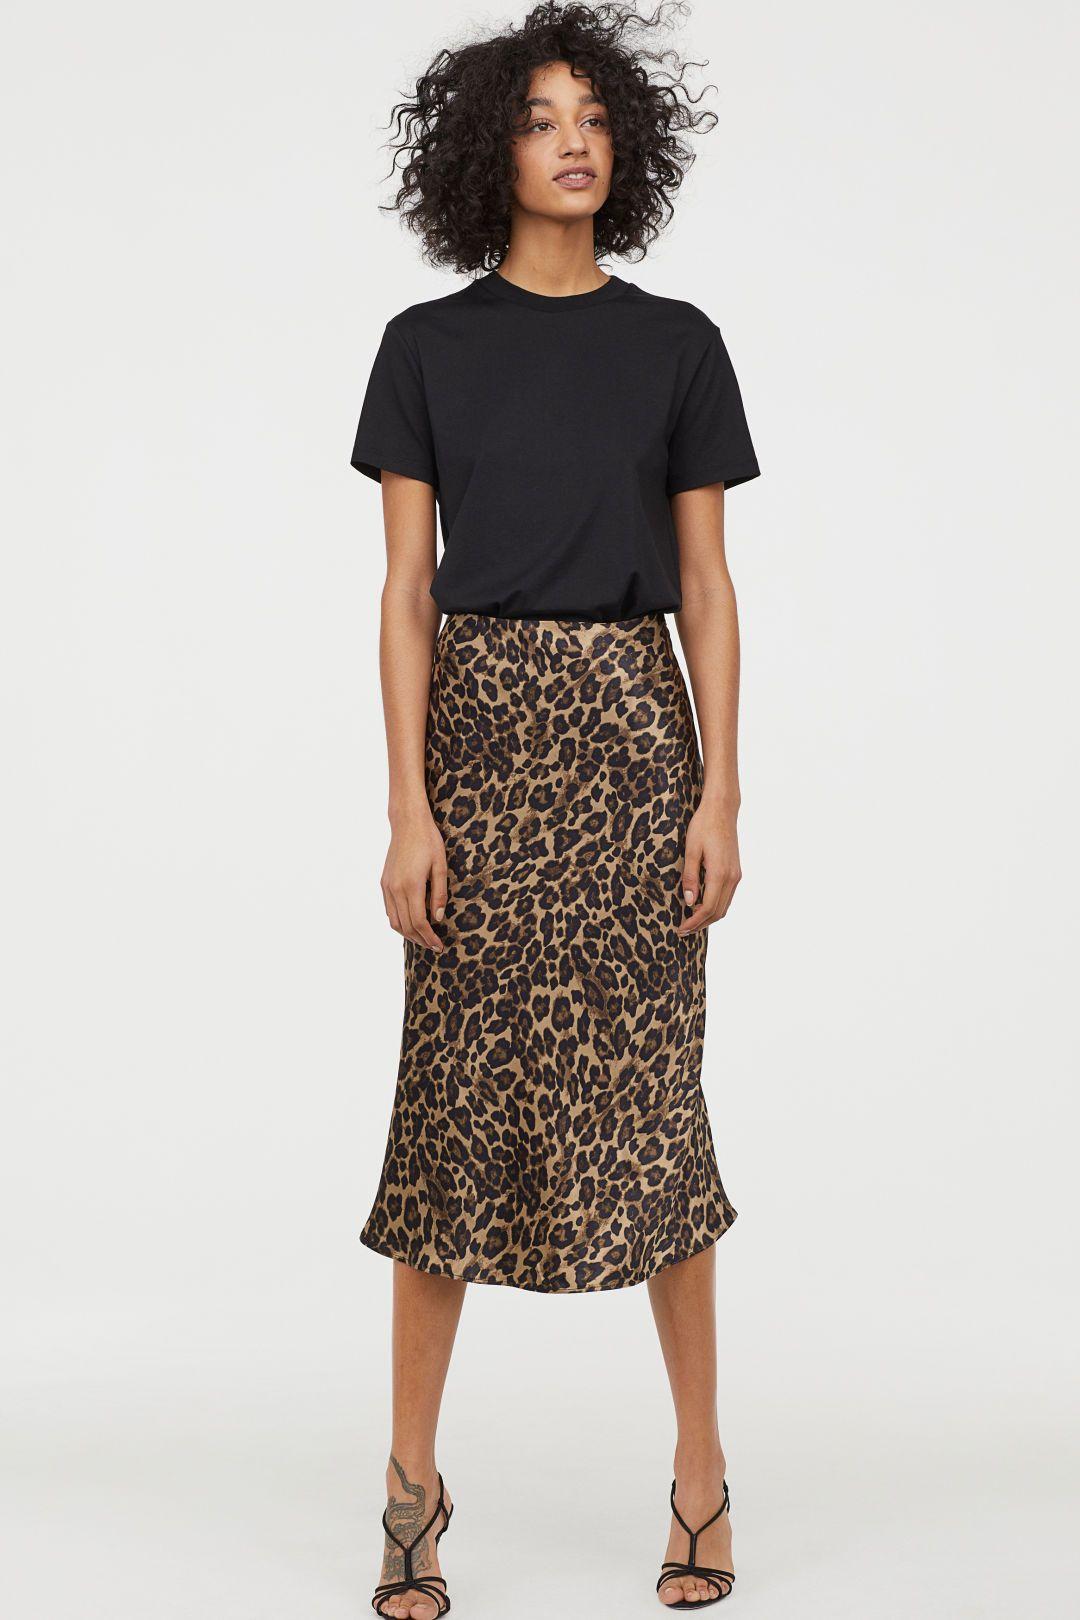 Skirt leopard skirt Leopard skirt skirt